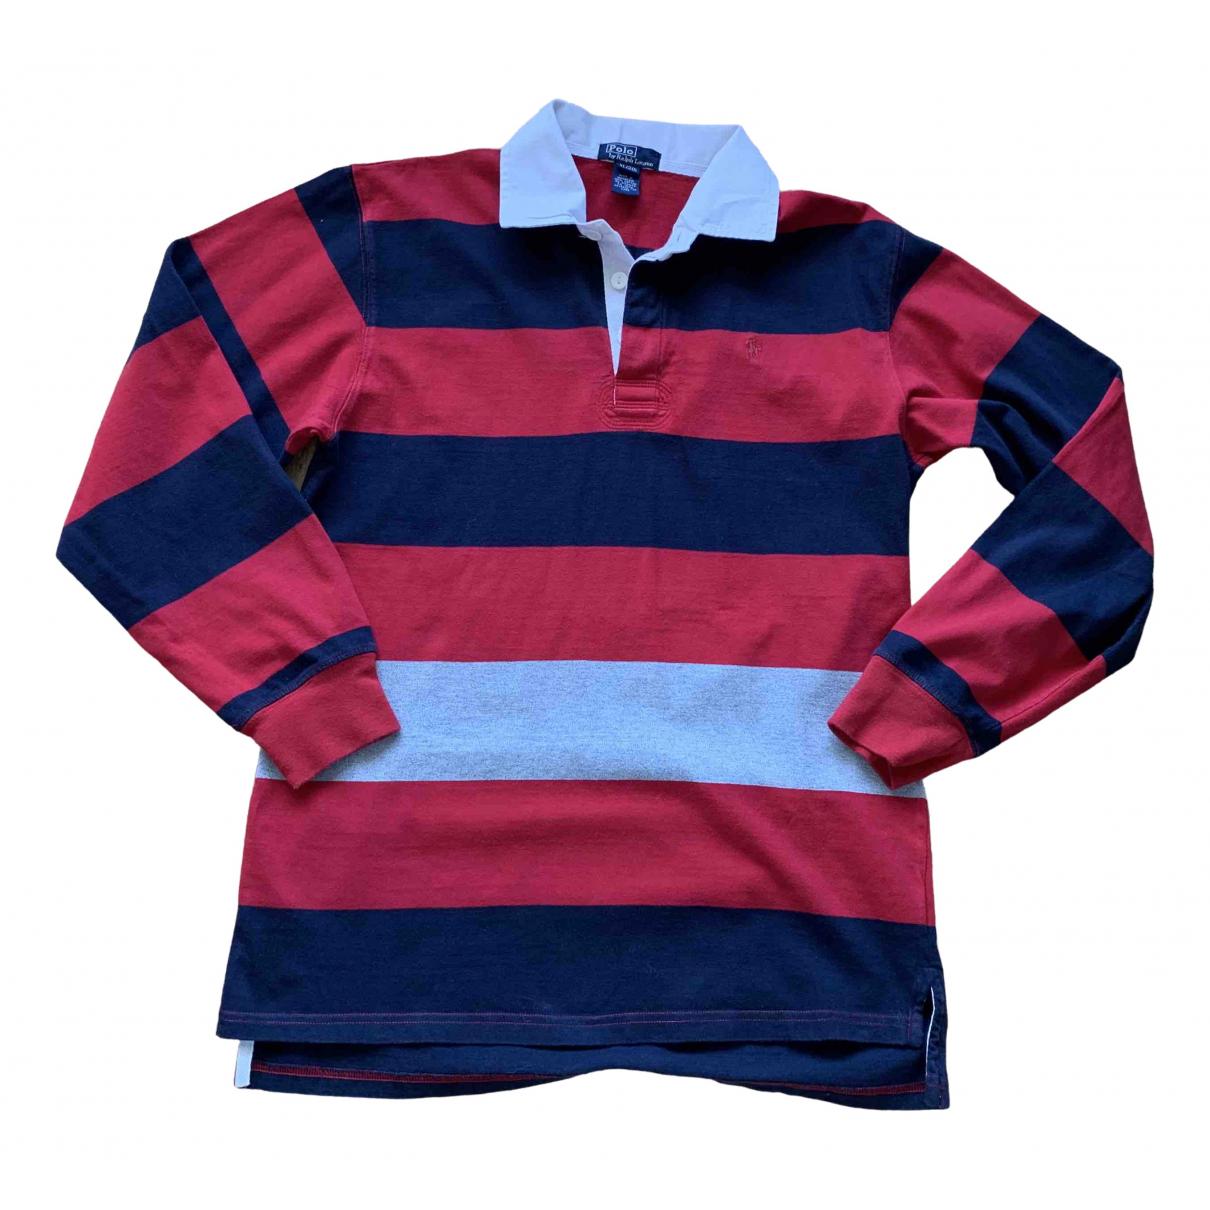 Polo Ralph Lauren \N Multicolour Cotton  top for Kids 20 years - XL FR